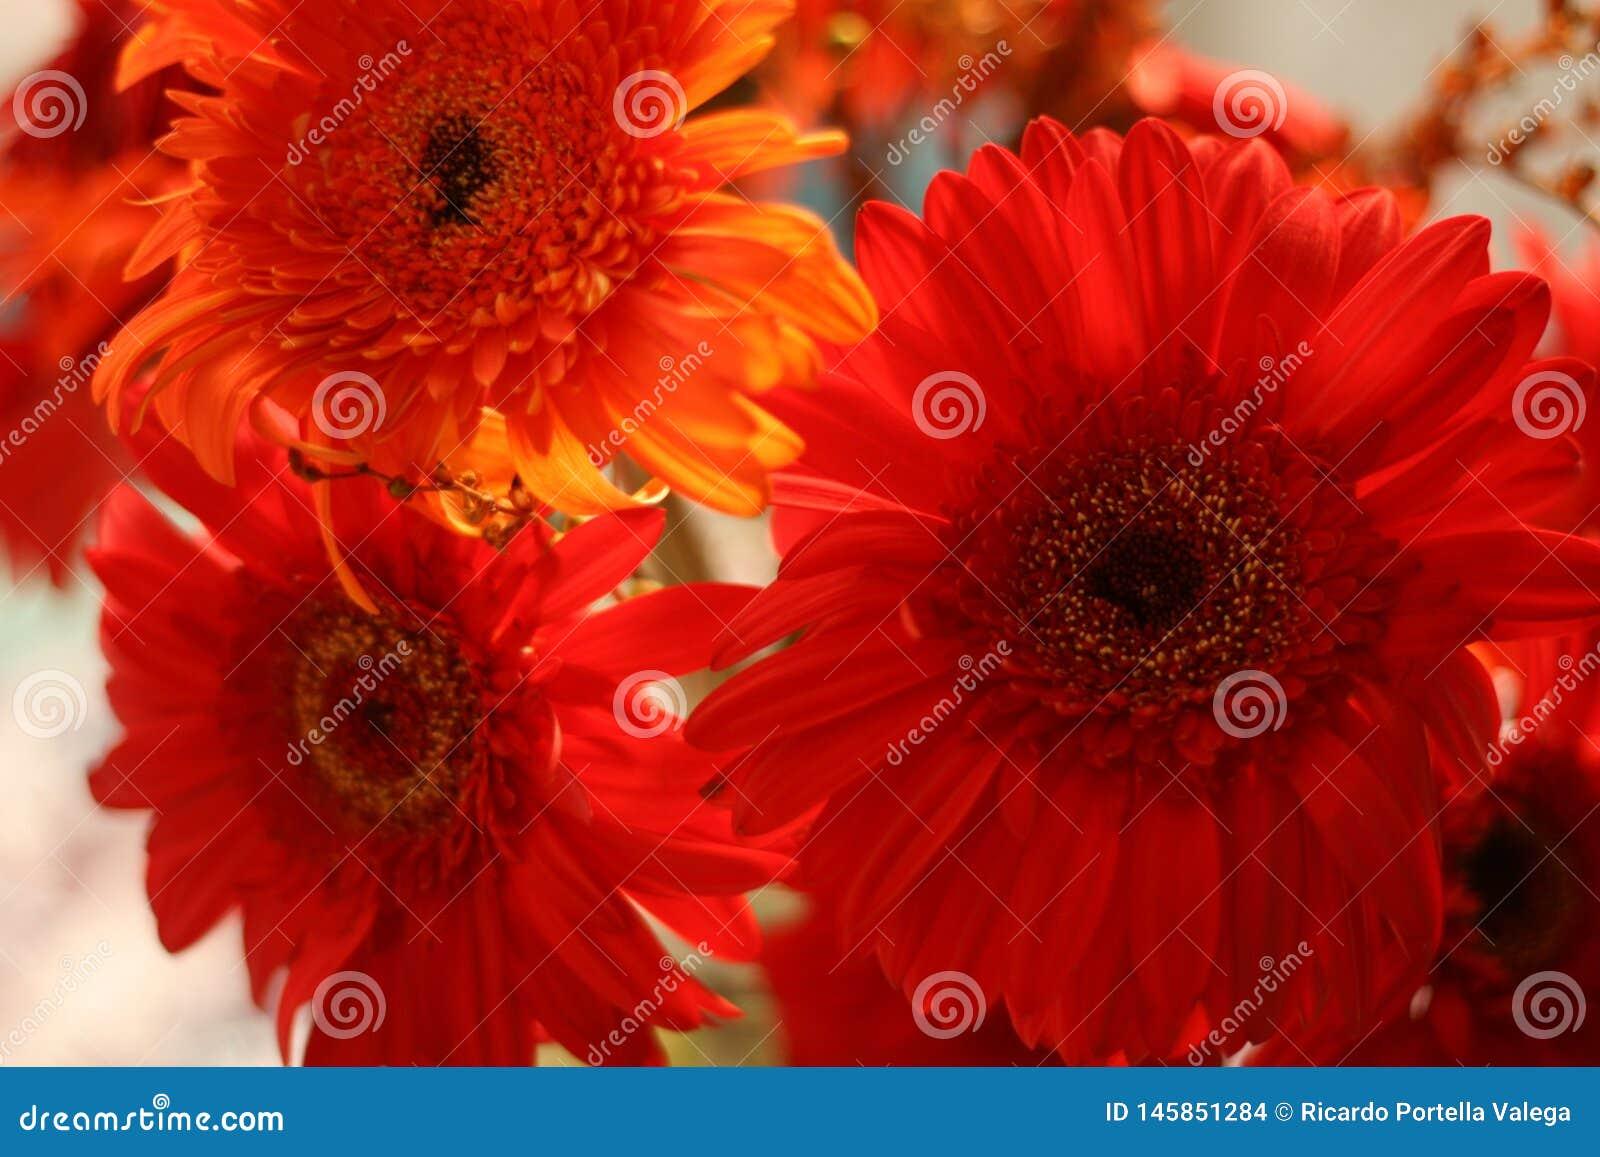 A beautiful Gerbera Daisy blossom